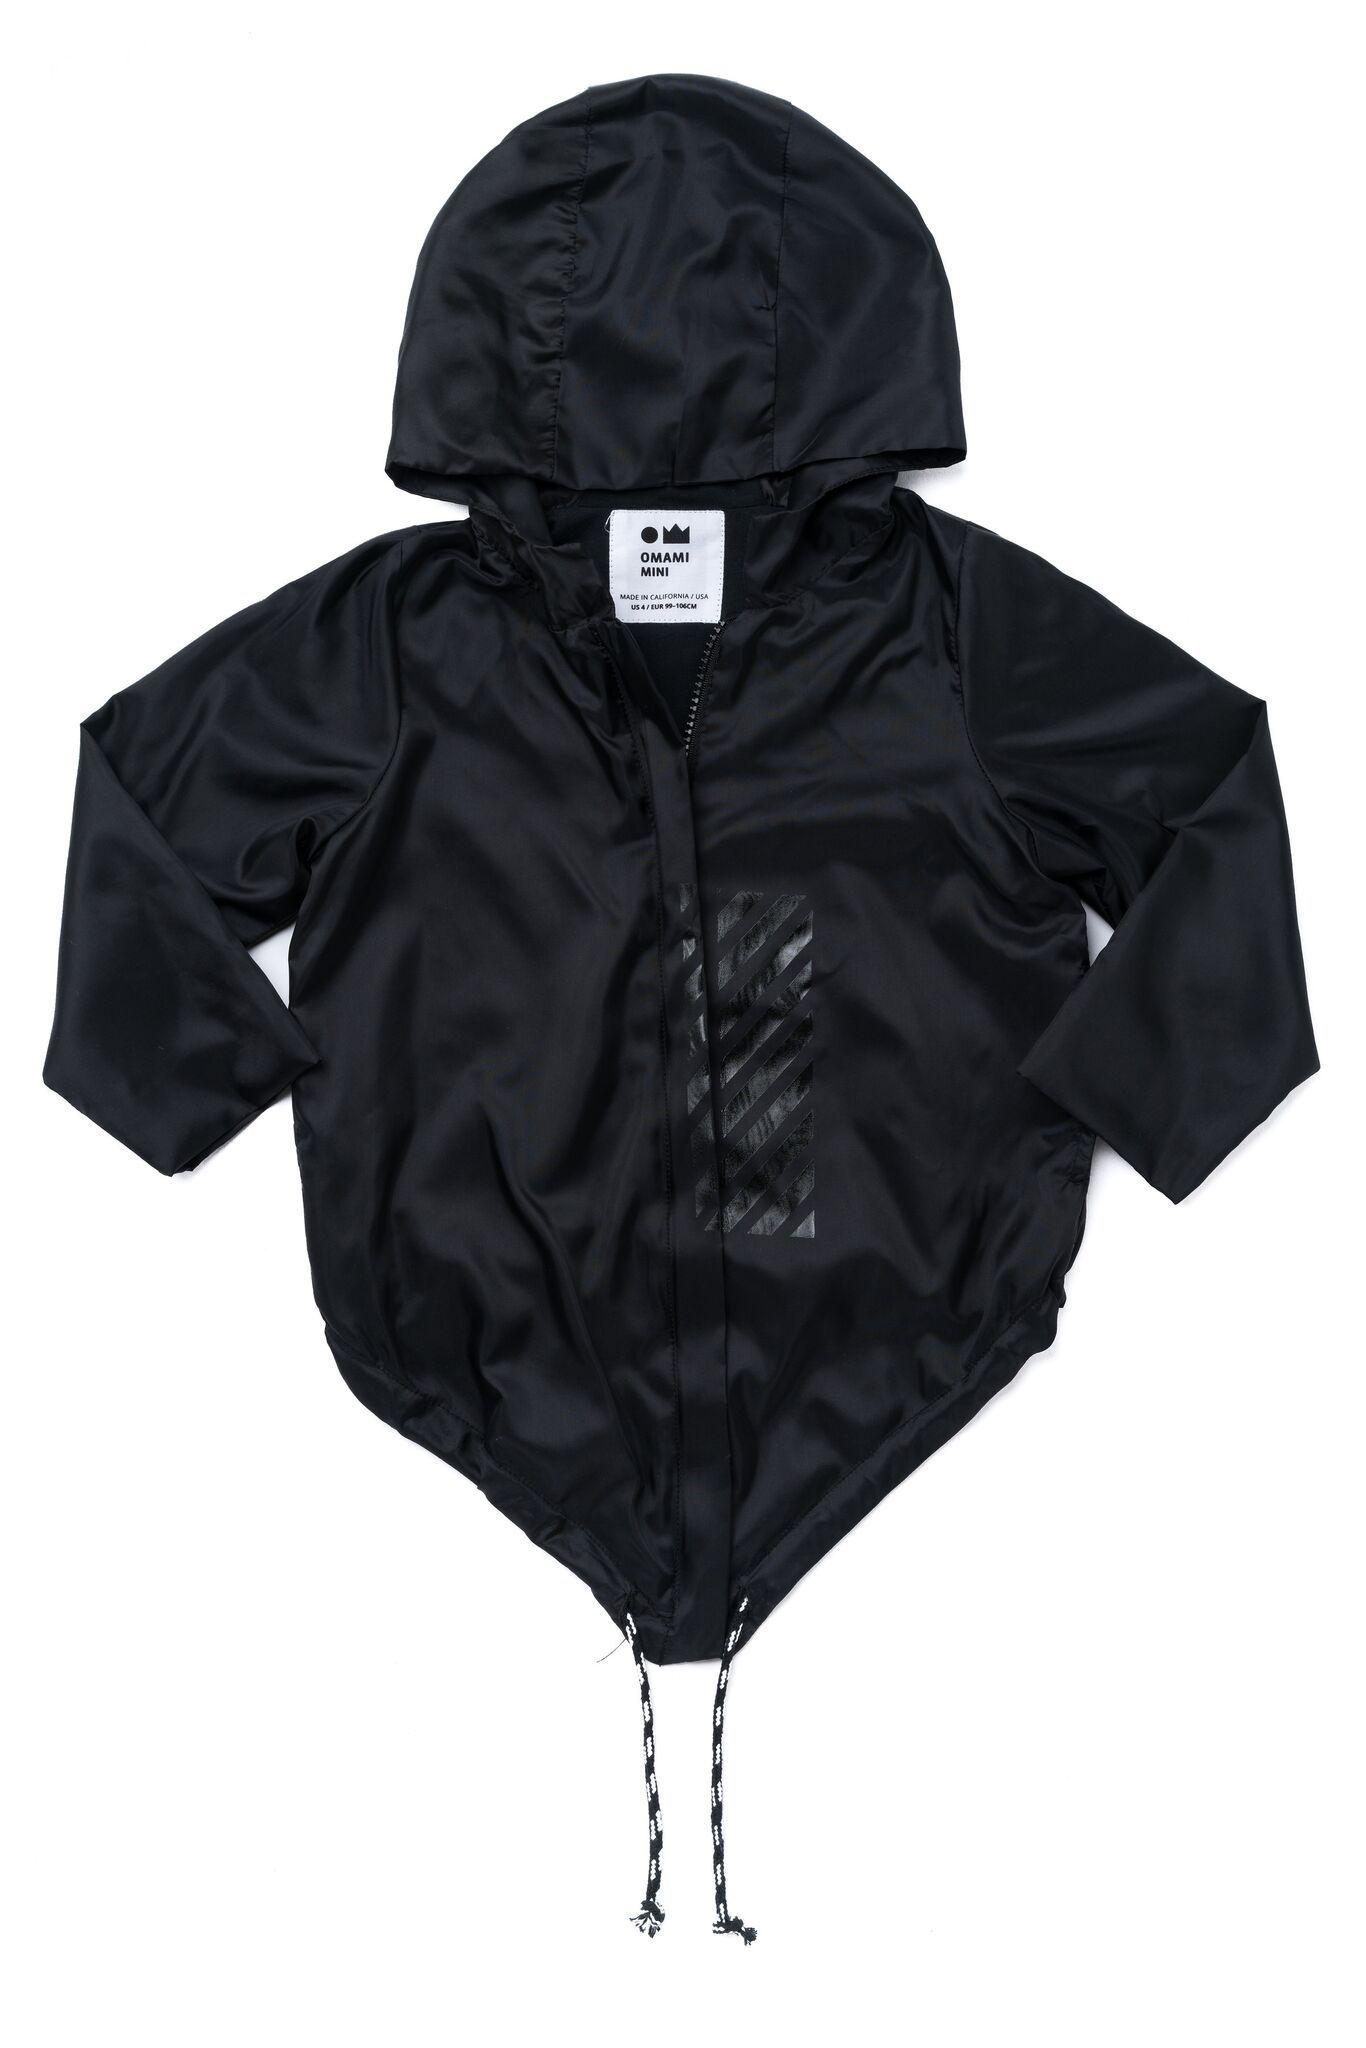 Superora Kids Rainwear Children PVC Waterproof Raincoat Hooded Poncho Button Down